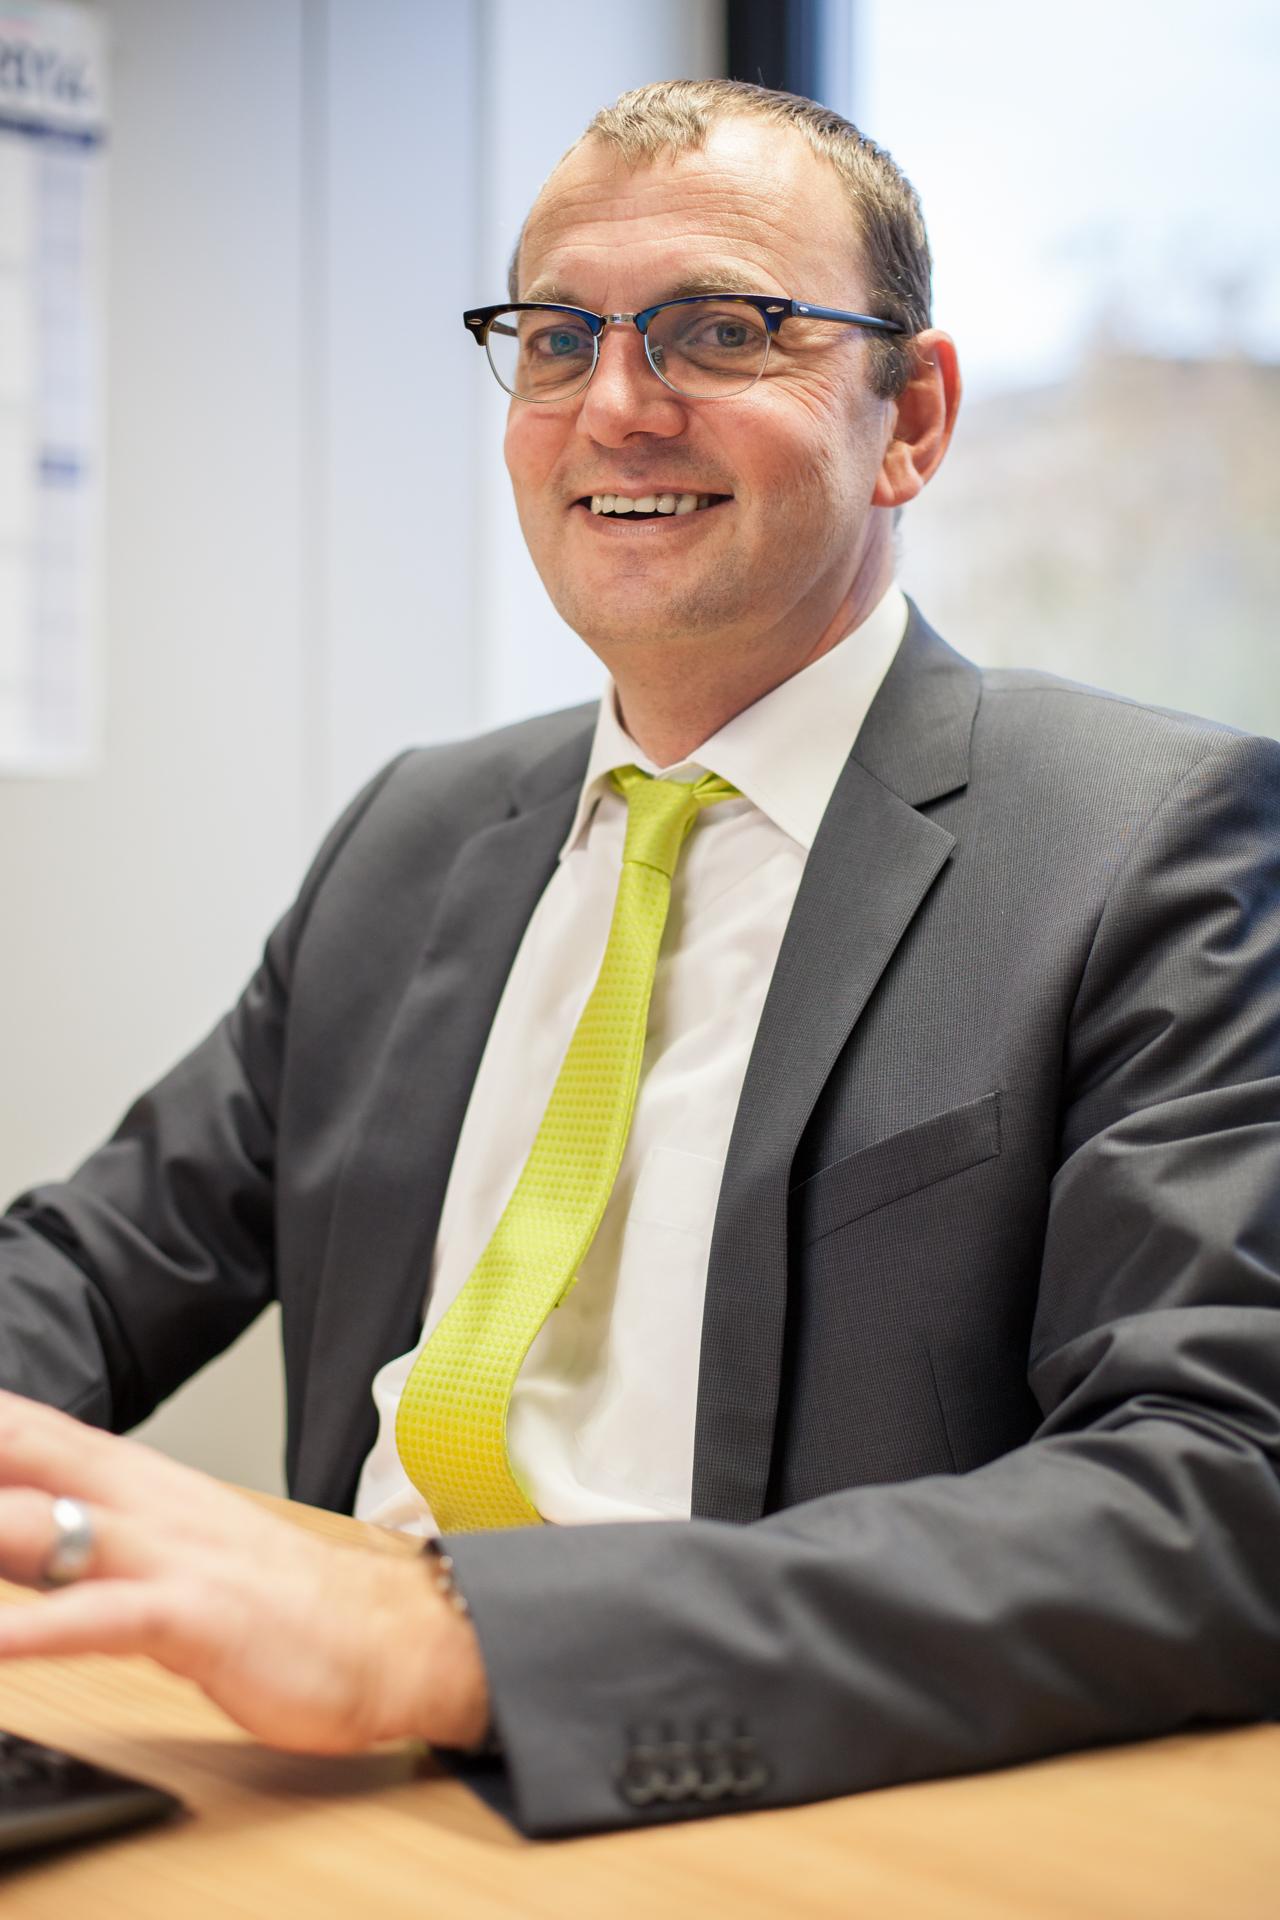 Andreas Hessel